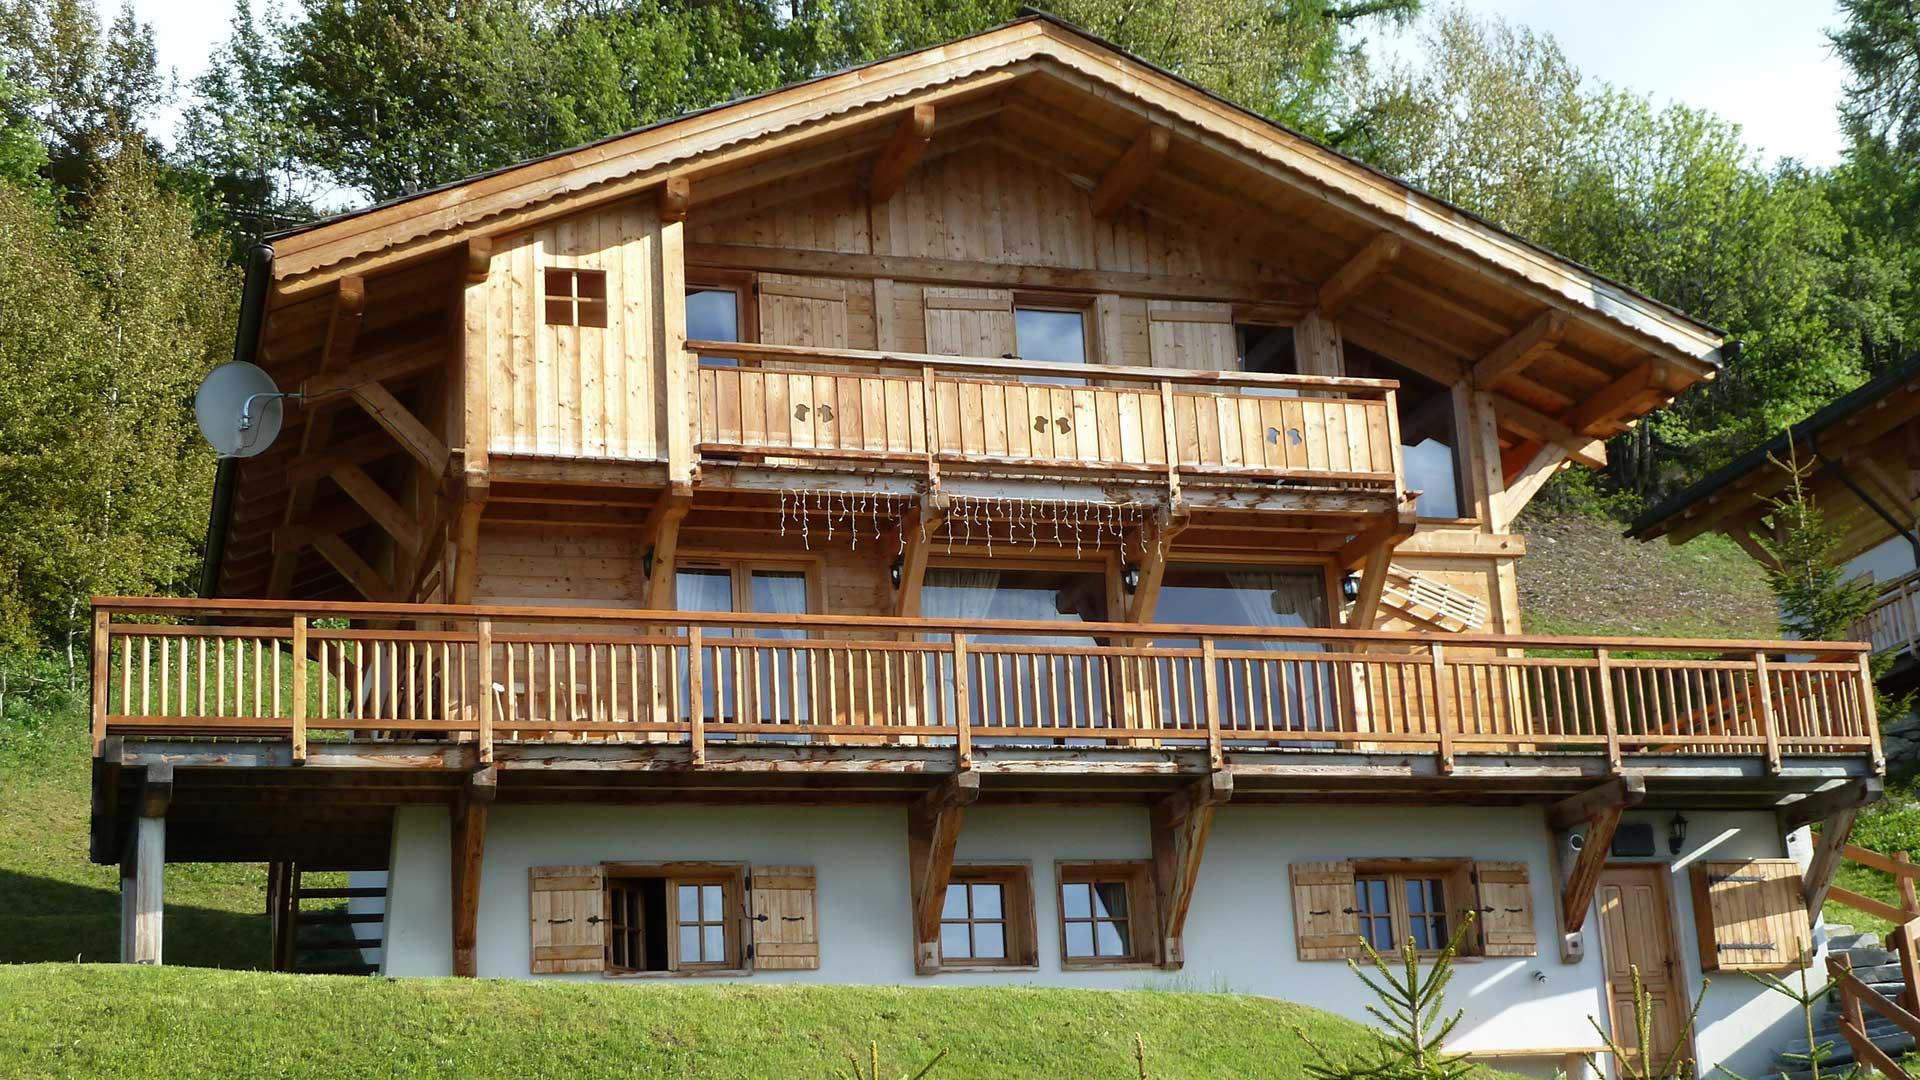 Chalet Cleves Chalet, Switzerland